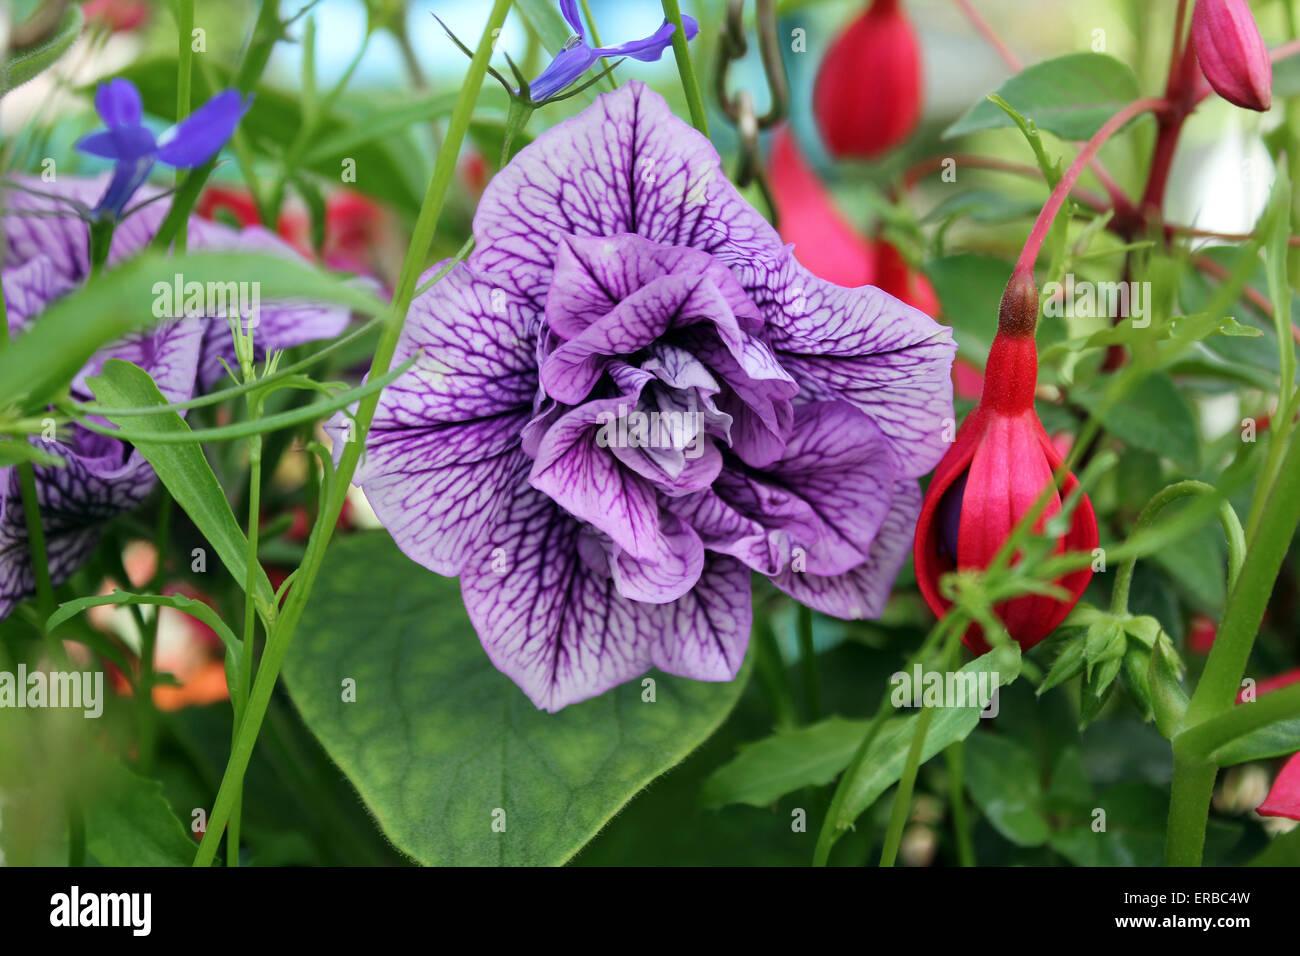 Petunia double Mauve Priscilla growing in hanging basket Stock Photo